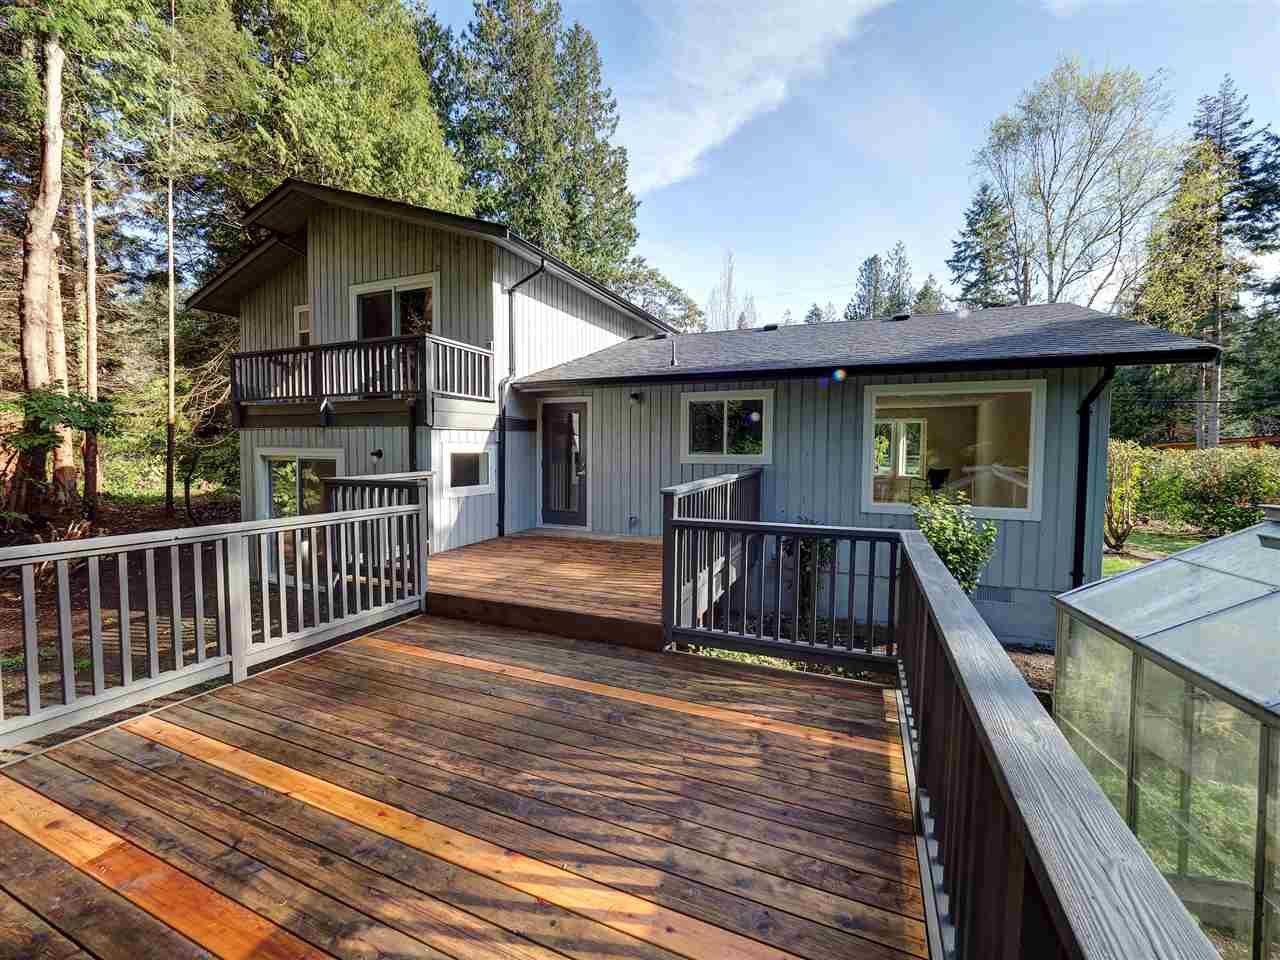 Photo 4: Photos: 1085 ROBERTS CREEK Road: Roberts Creek House for sale (Sunshine Coast)  : MLS®# R2392415